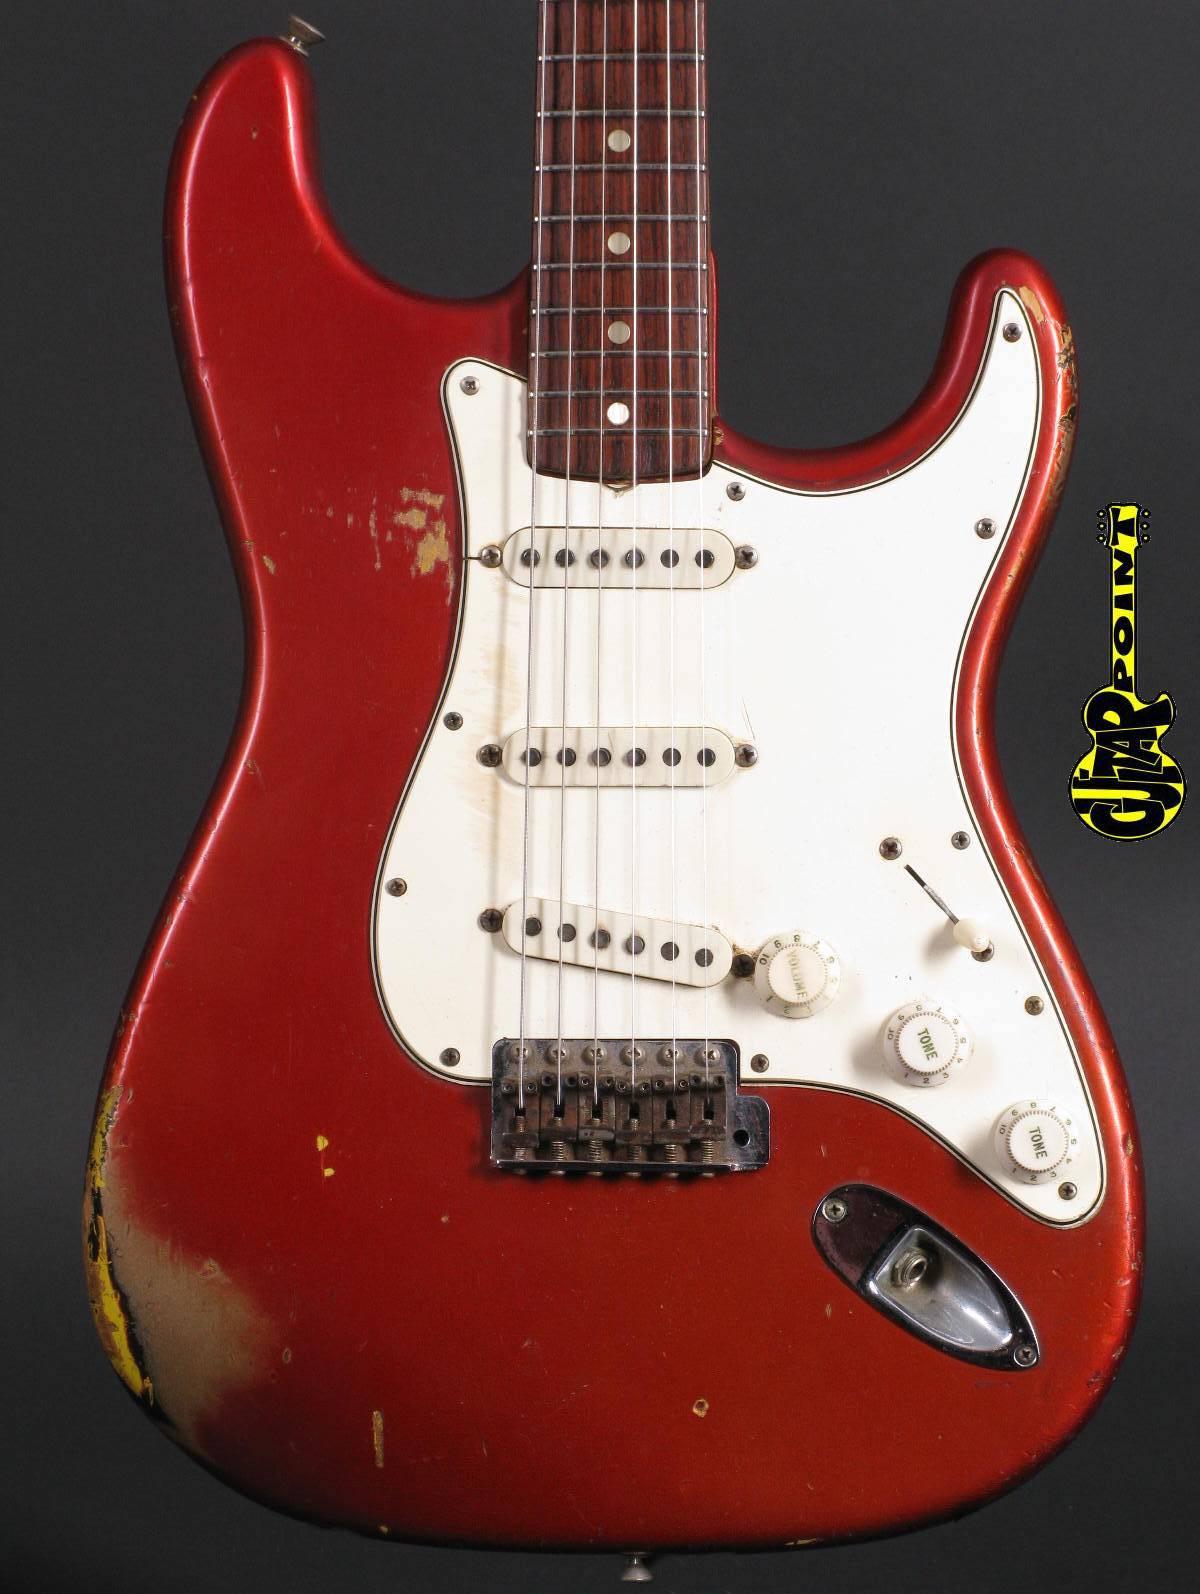 1966 Fender Stratocaster - Candy Apple Red over 3t-Sunburst